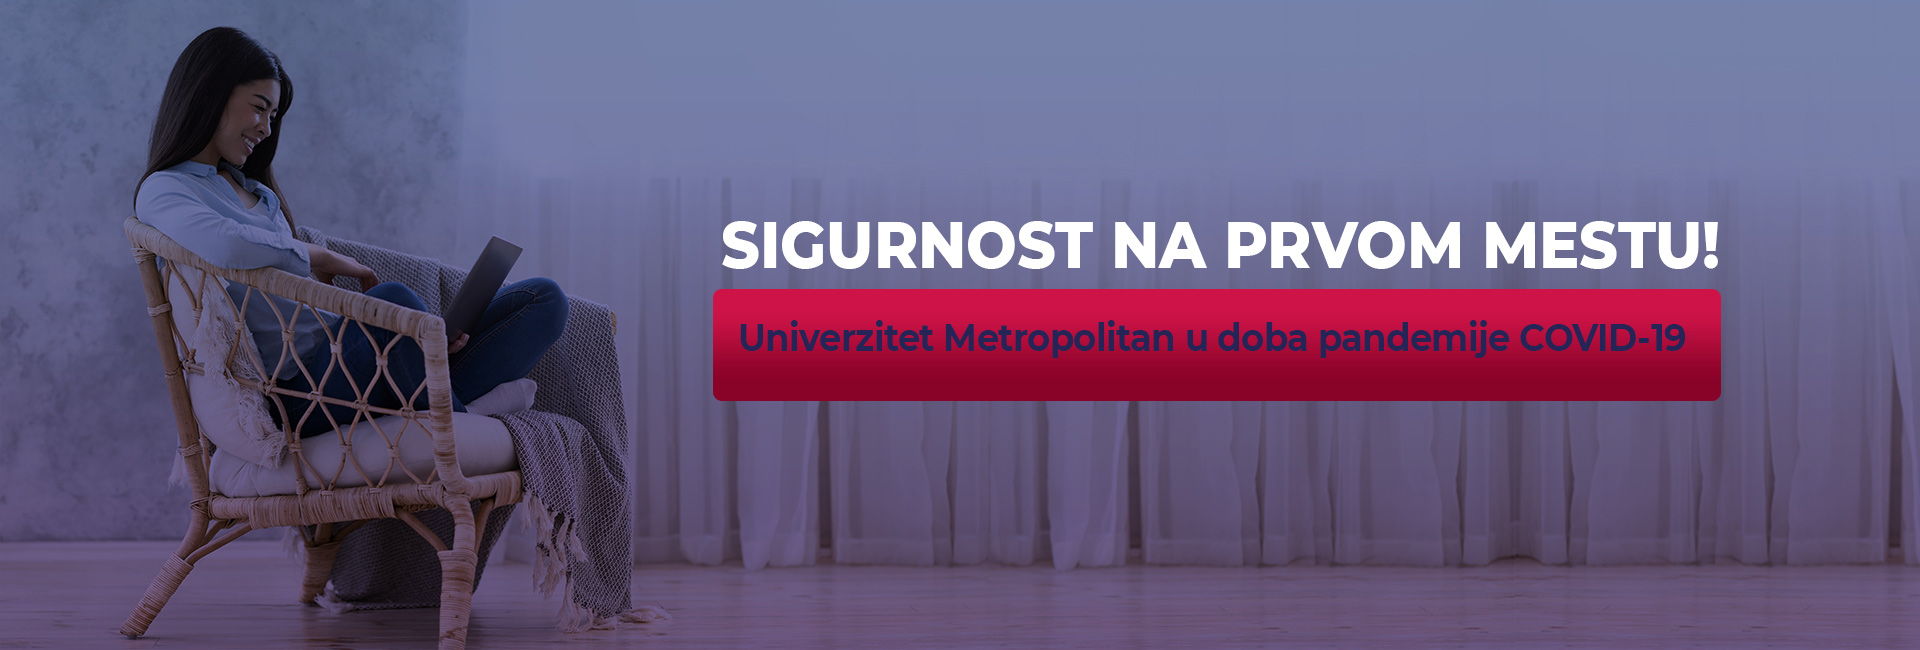 COVID-19 Univerzitet Metropolitan